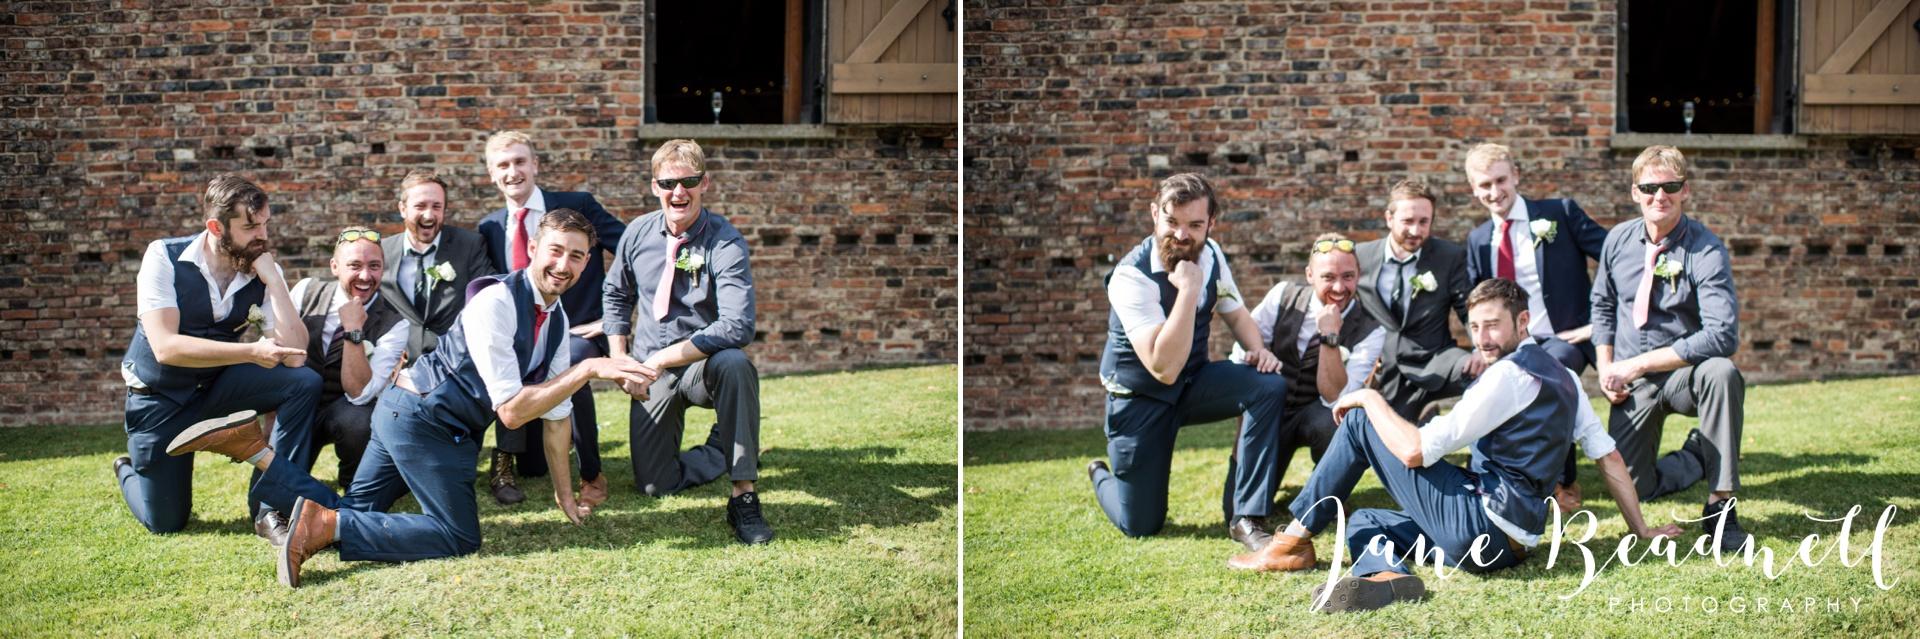 yorkshire-fine-art-wedding-photographer-jane-beadnell-photography-poppleton-york_0093